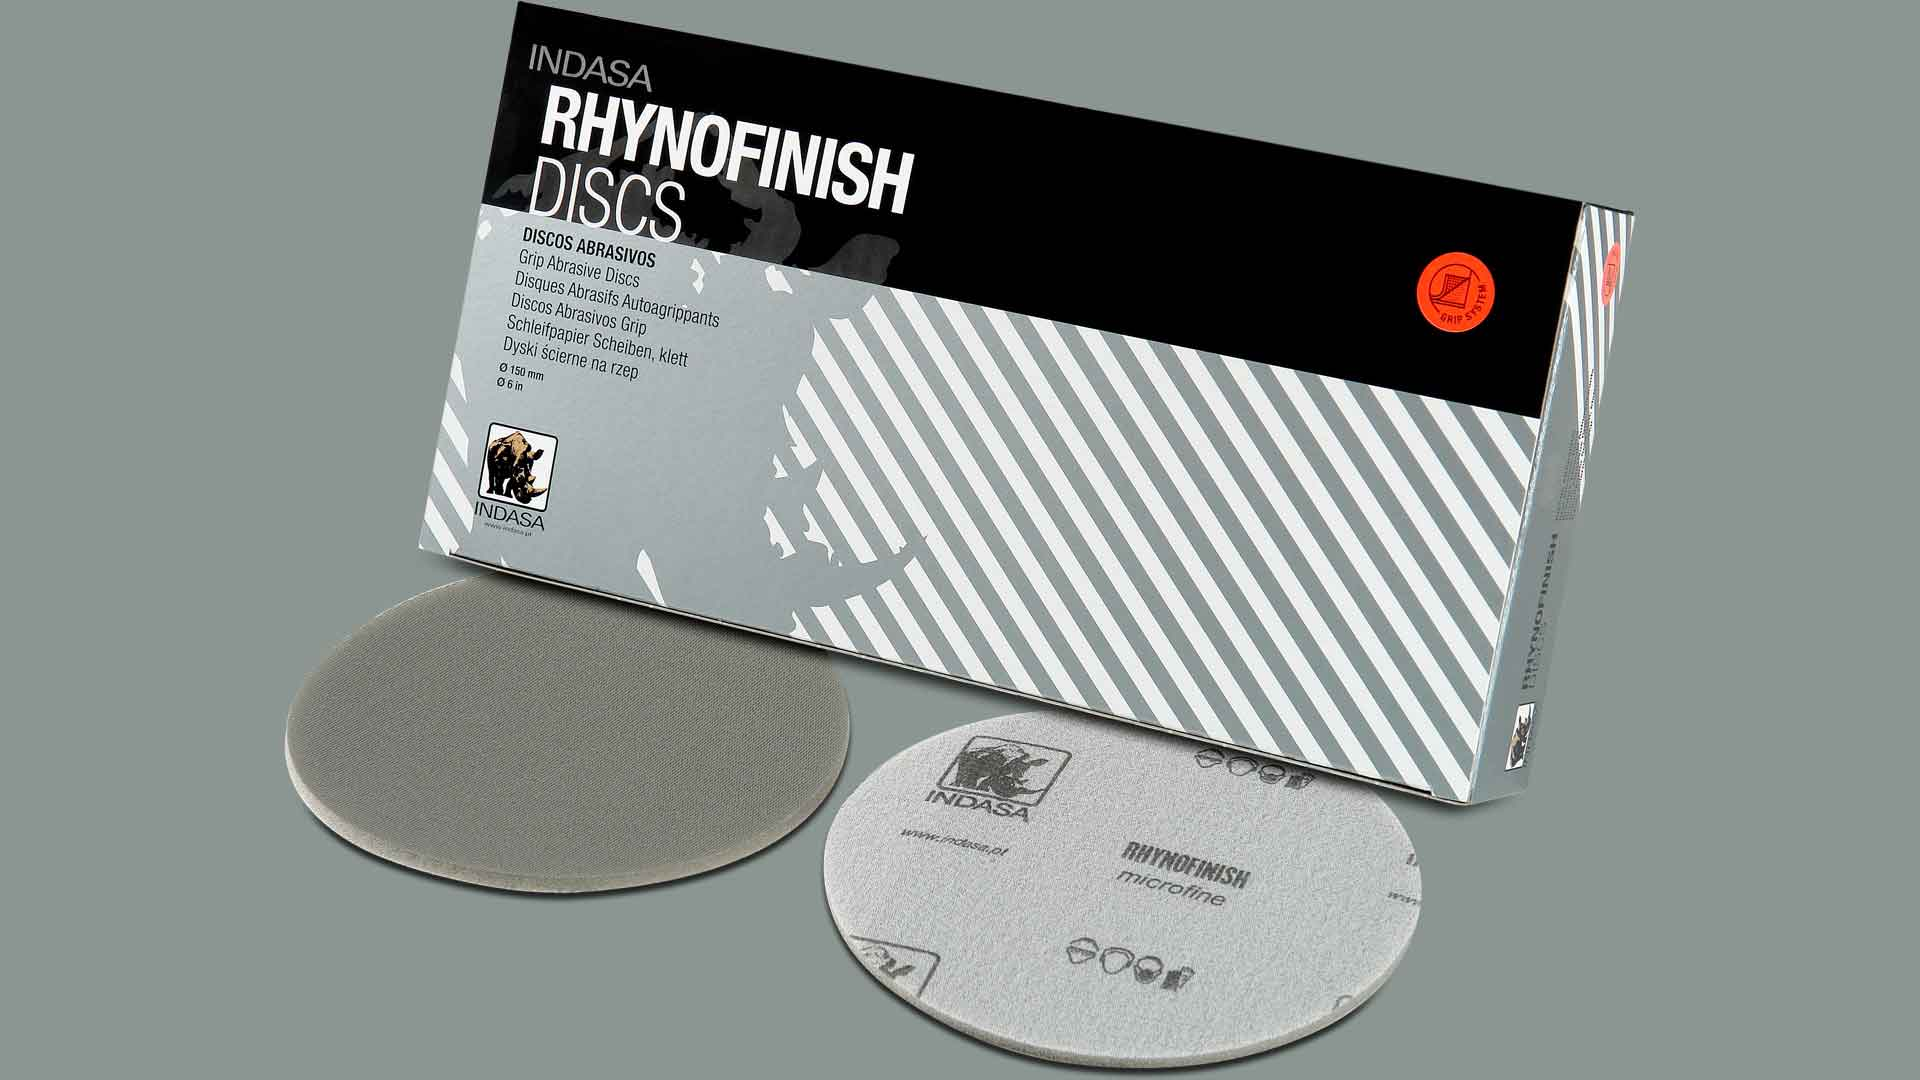 INDASA Abrasives Rhynofinish discs